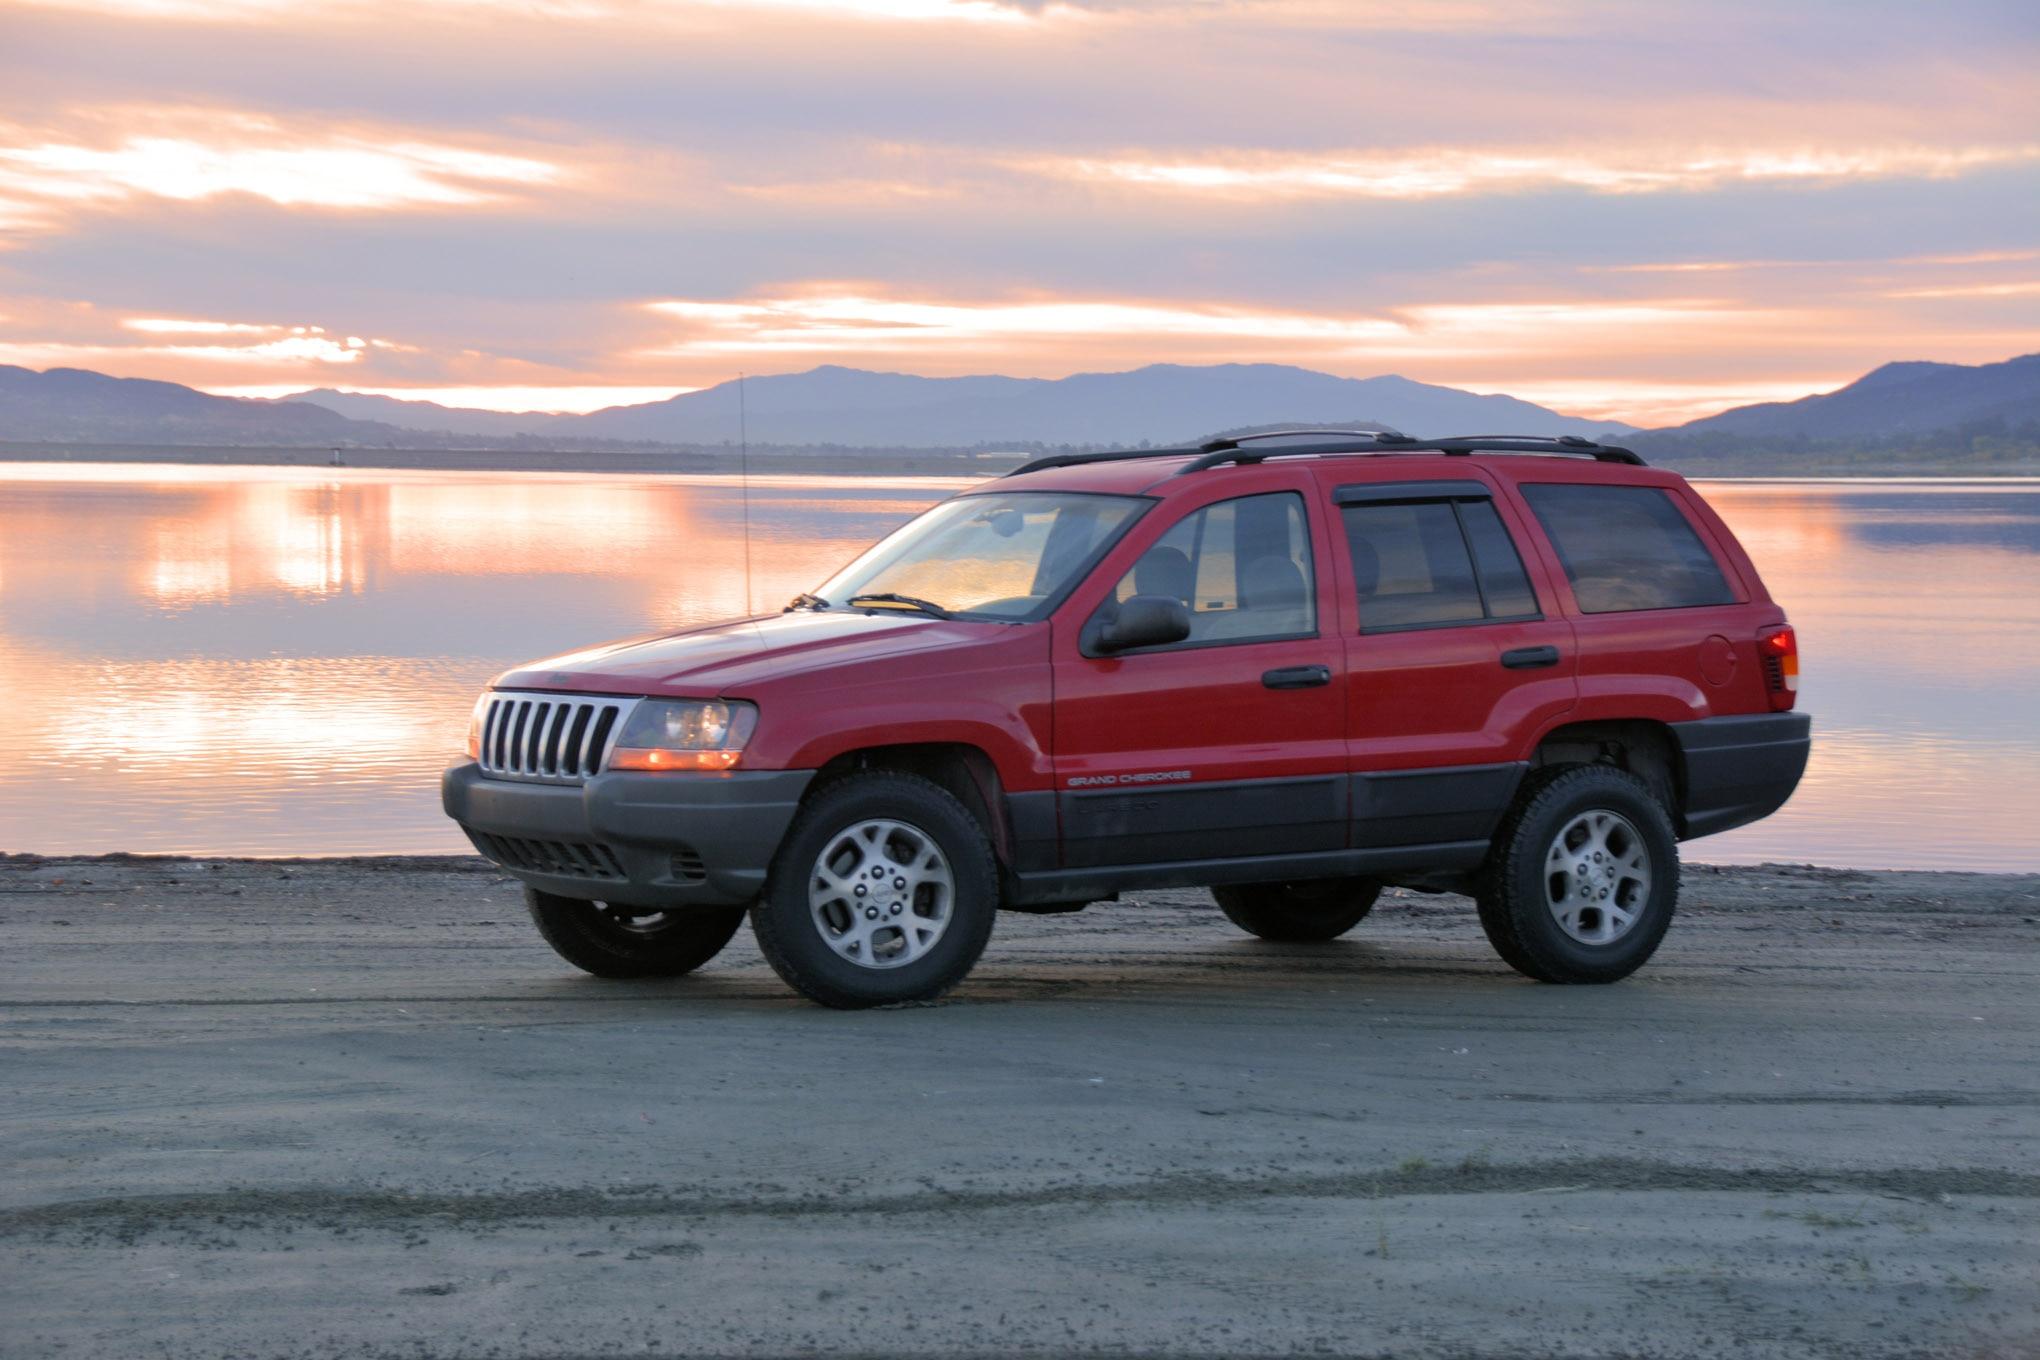 diy jeep sound nav info system upgrade lead